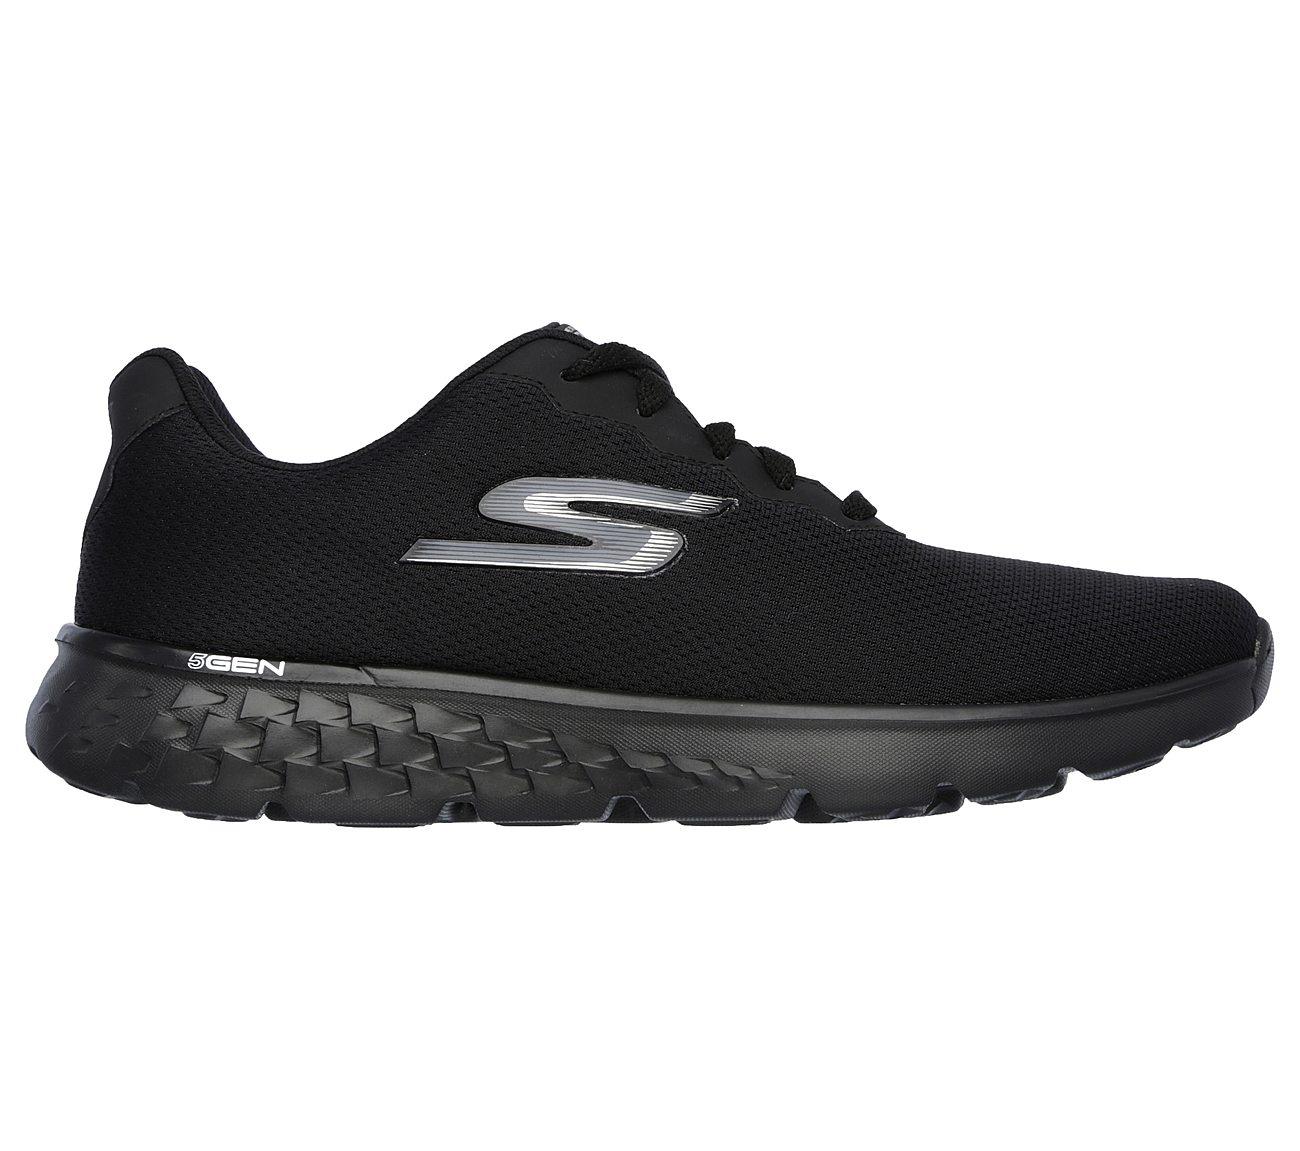 Skechers Performance Women's Go Run 400 Action Running Shoe